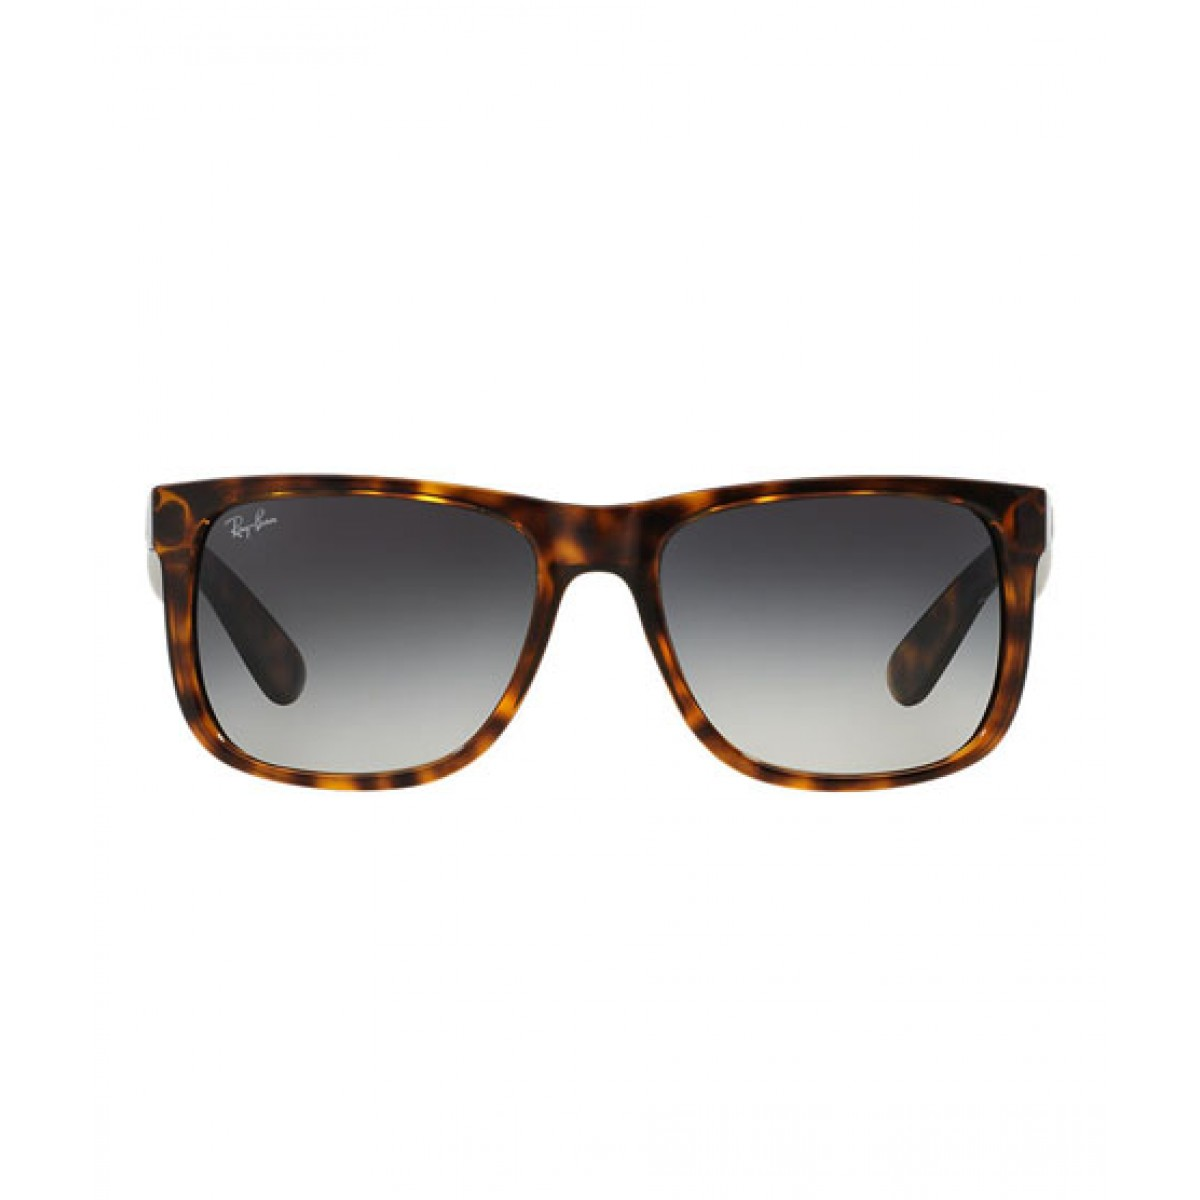 56b3b2dbba RayBan Justin Sunglasses Price in Pakistan